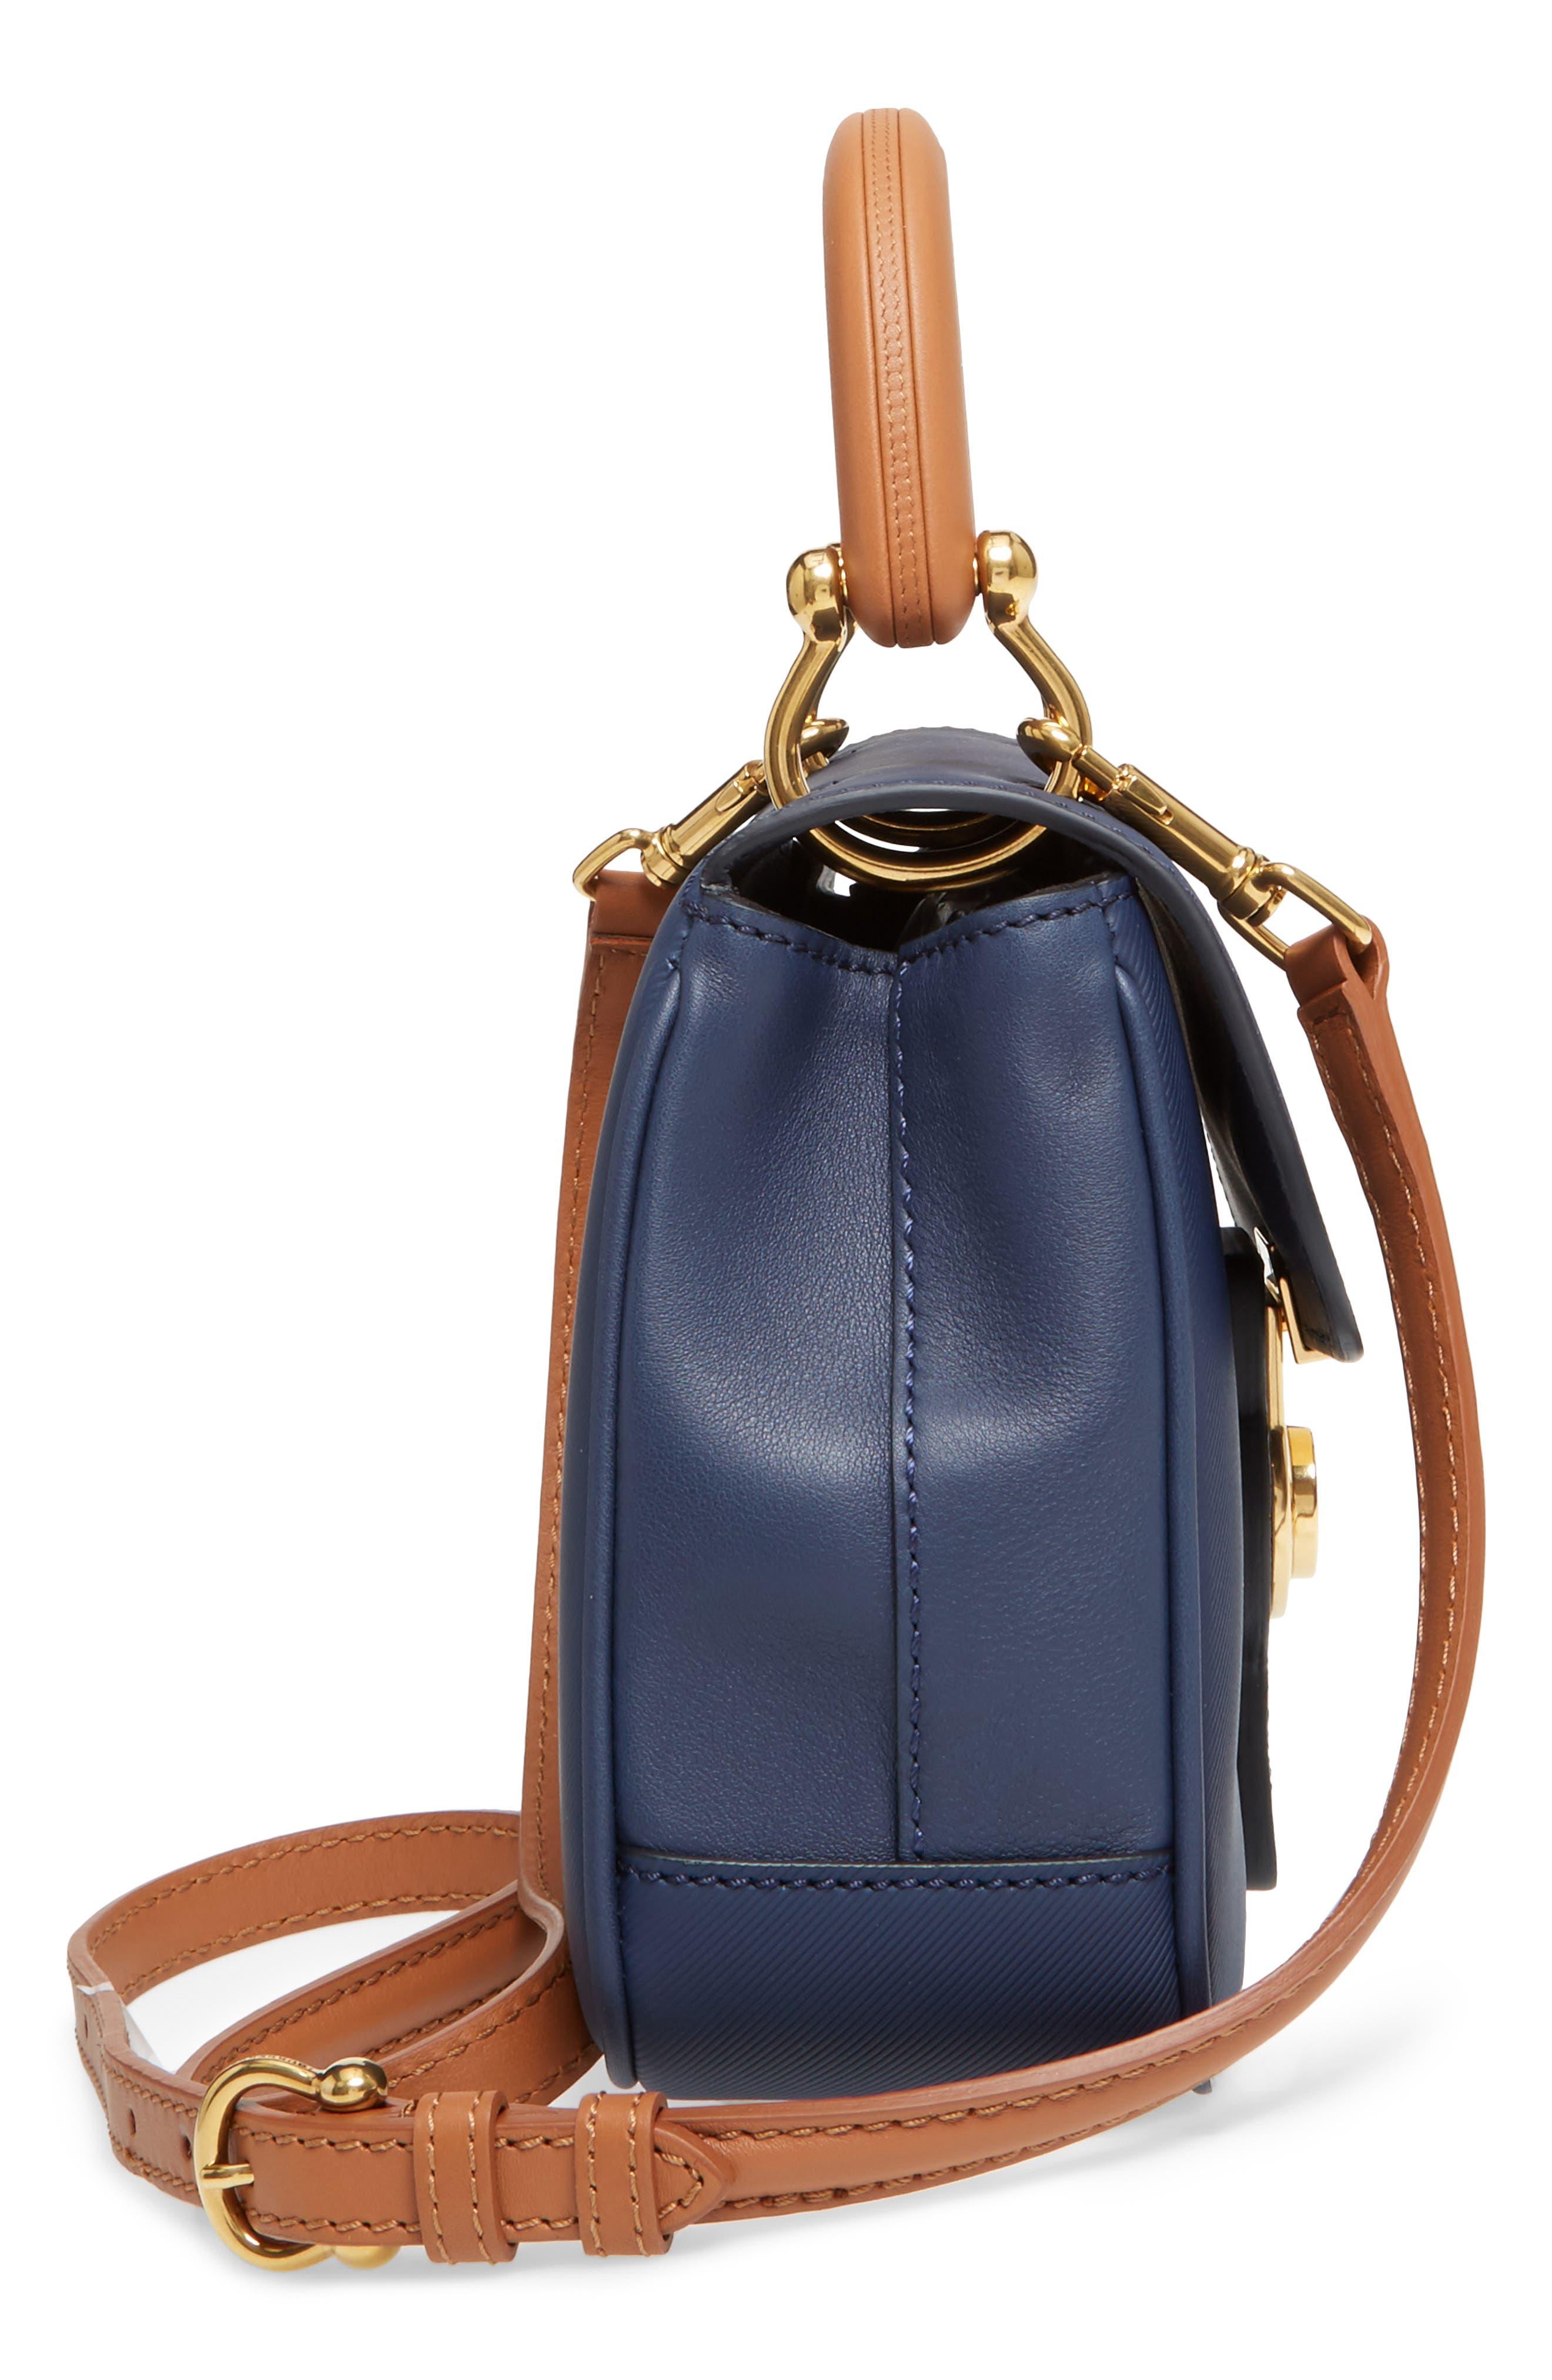 Medium DK88 Leather Satchel,                             Alternate thumbnail 3, color,                             Ink Blue